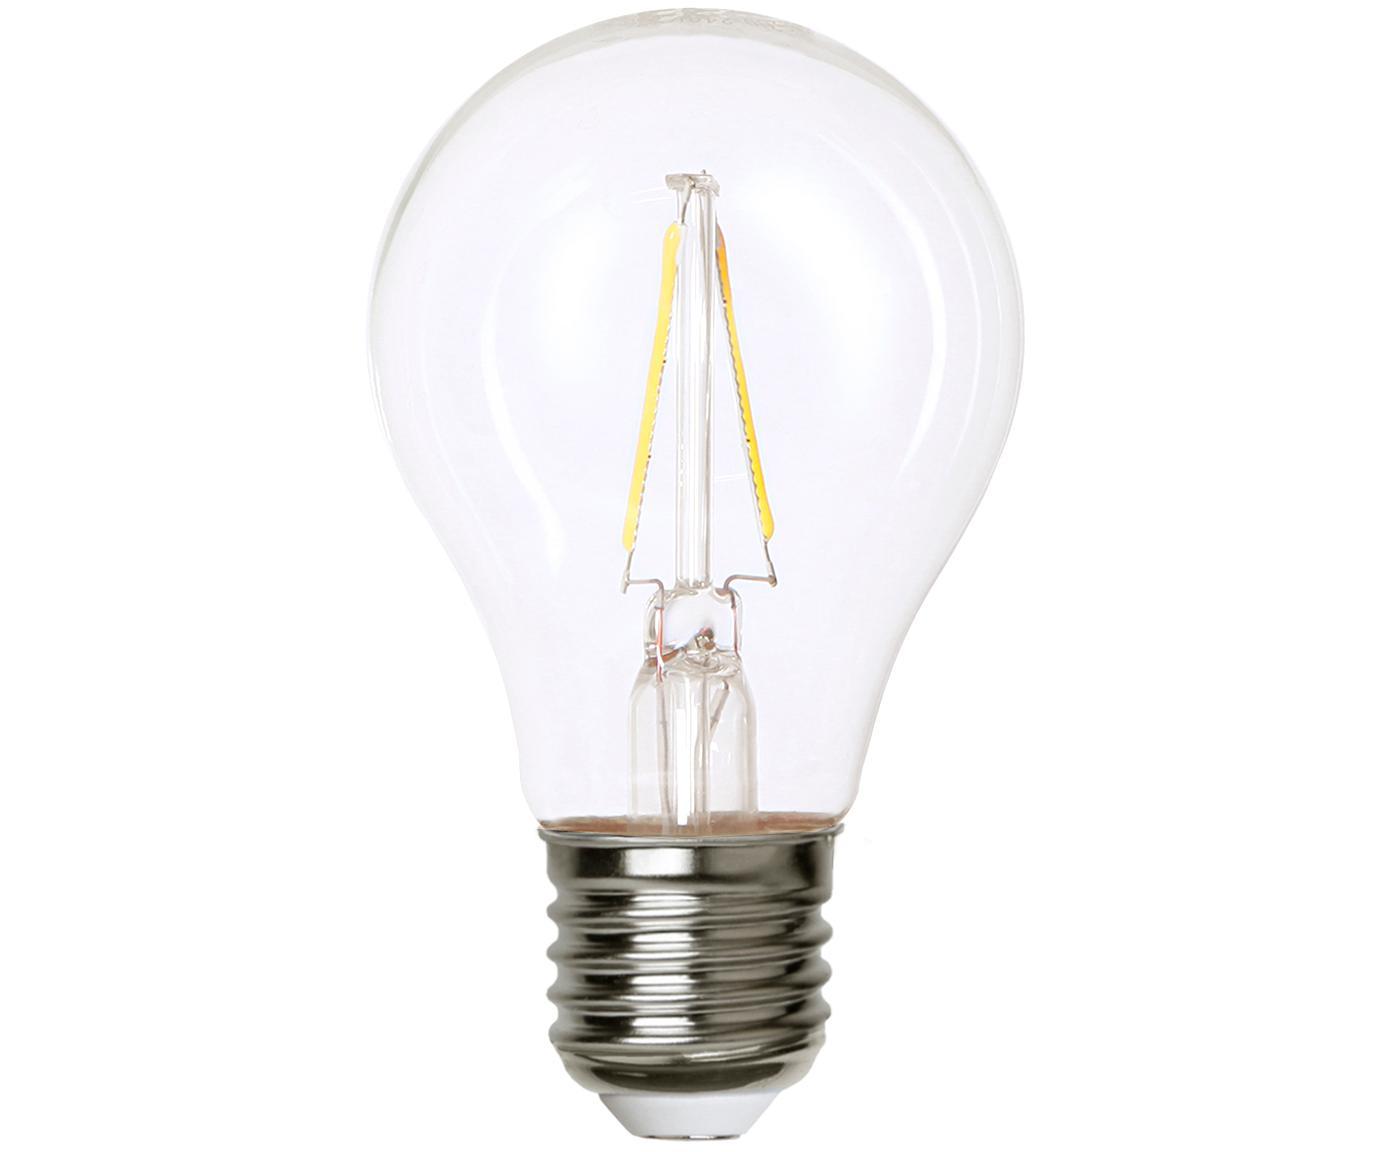 Lampadina a LED Airtight Two (E27 / 2Watt), Paralume: vetro, Base lampadina: rame, nichelato, Trasparente, nichel, Ø 6 x Alt. 11 cm